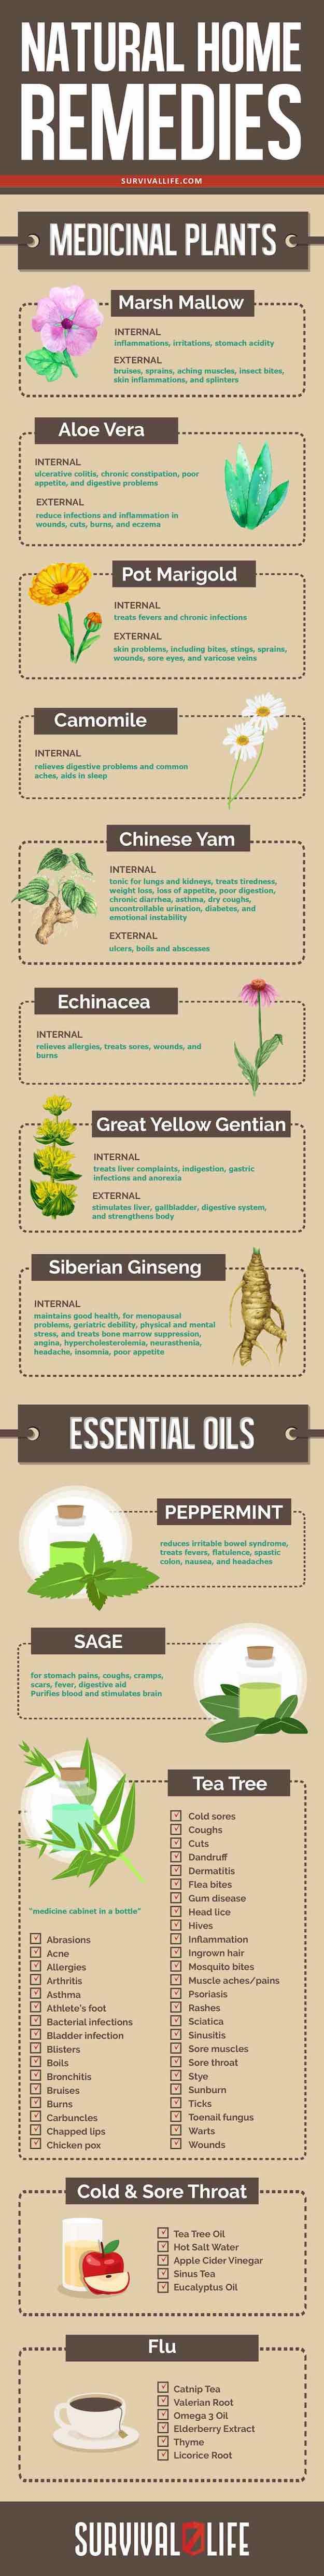 Medicinal Plants You Need To Make Natural Home Remedies   https://survivallife.com/medicinal-plants-home-remedies/